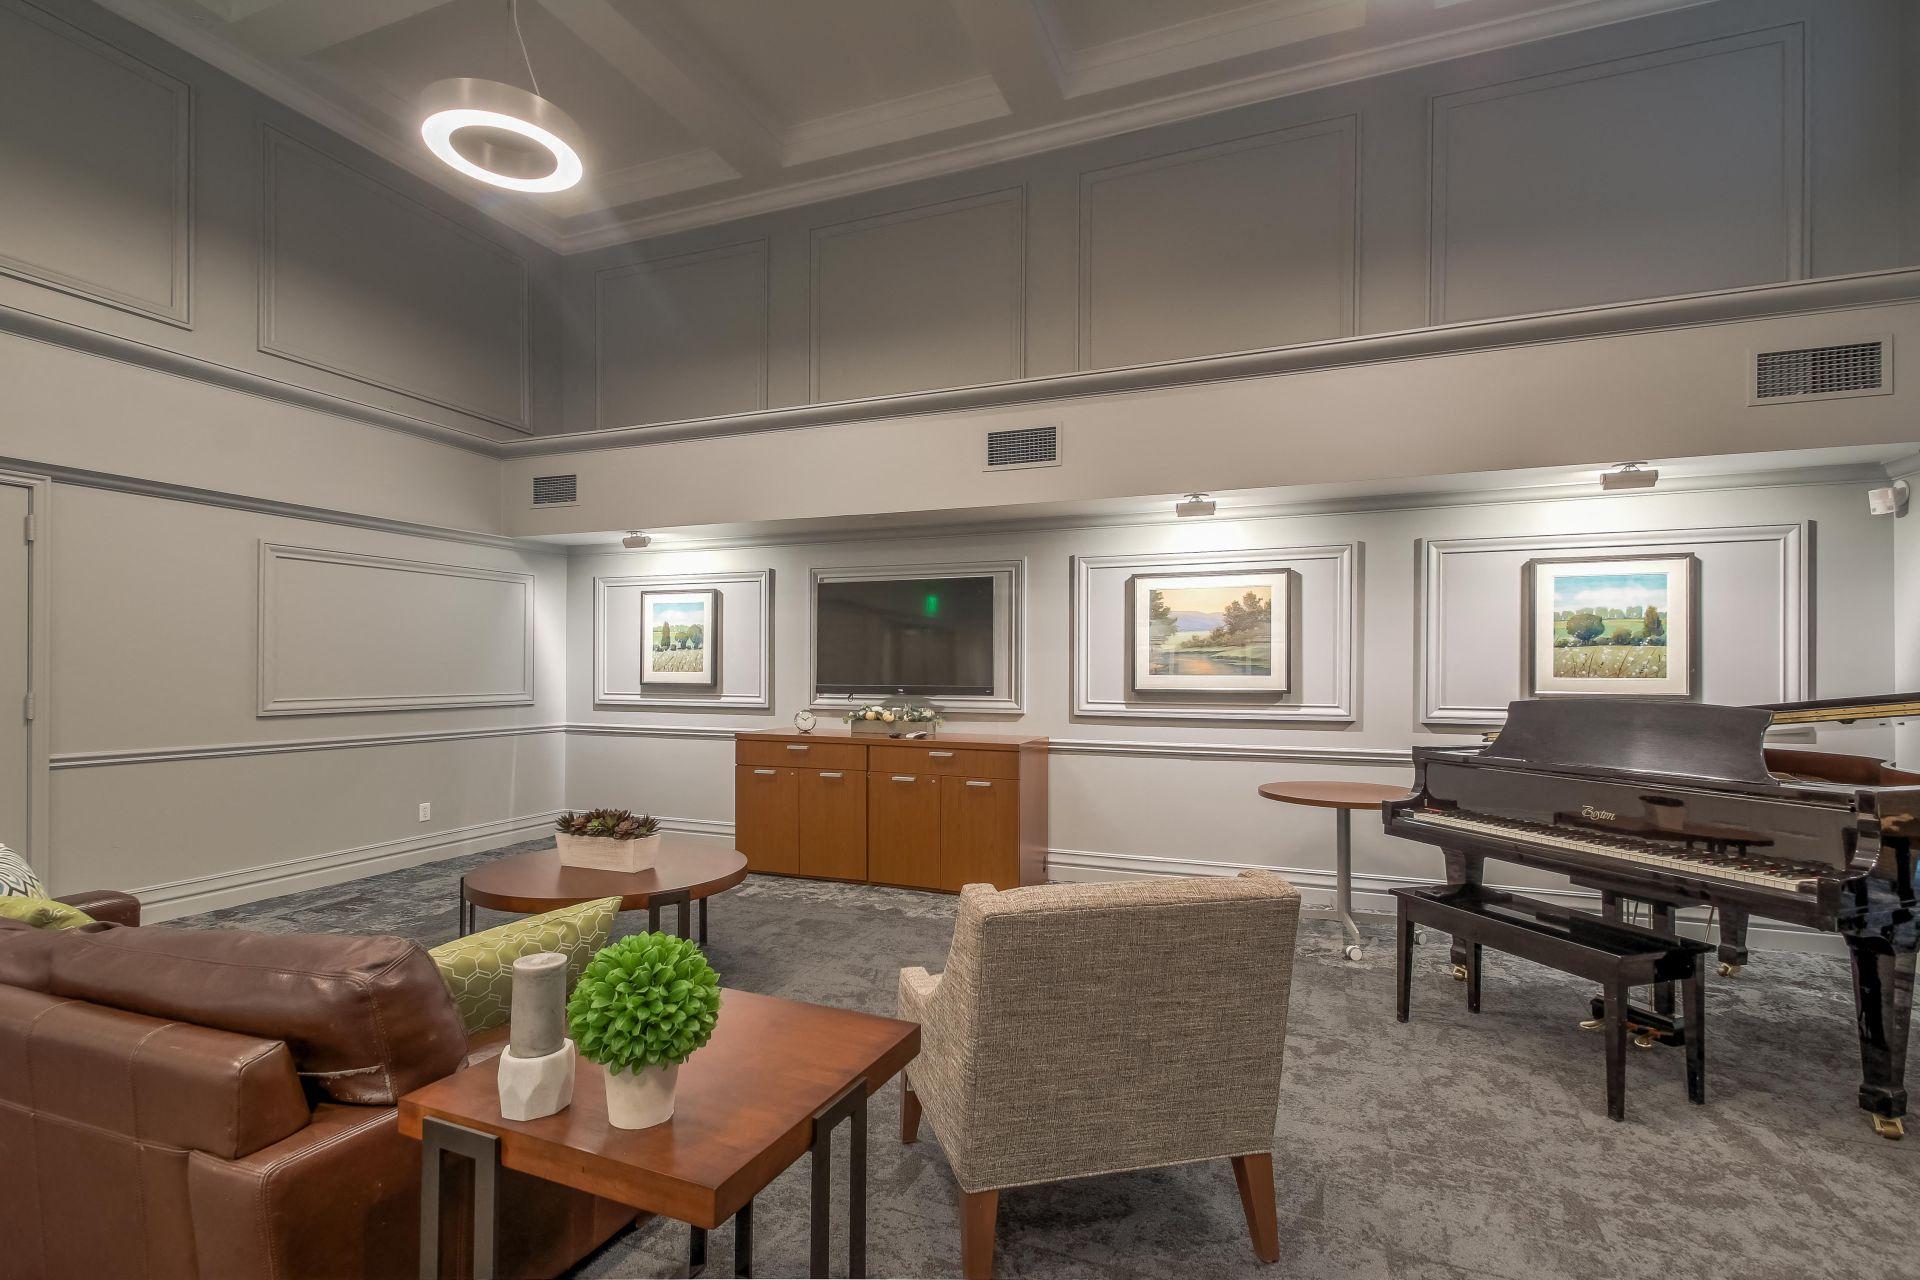 3 Bedroom Apartments Salt Lake City Photos And Video Of Brigham Apartments In Salt Lake City Ut